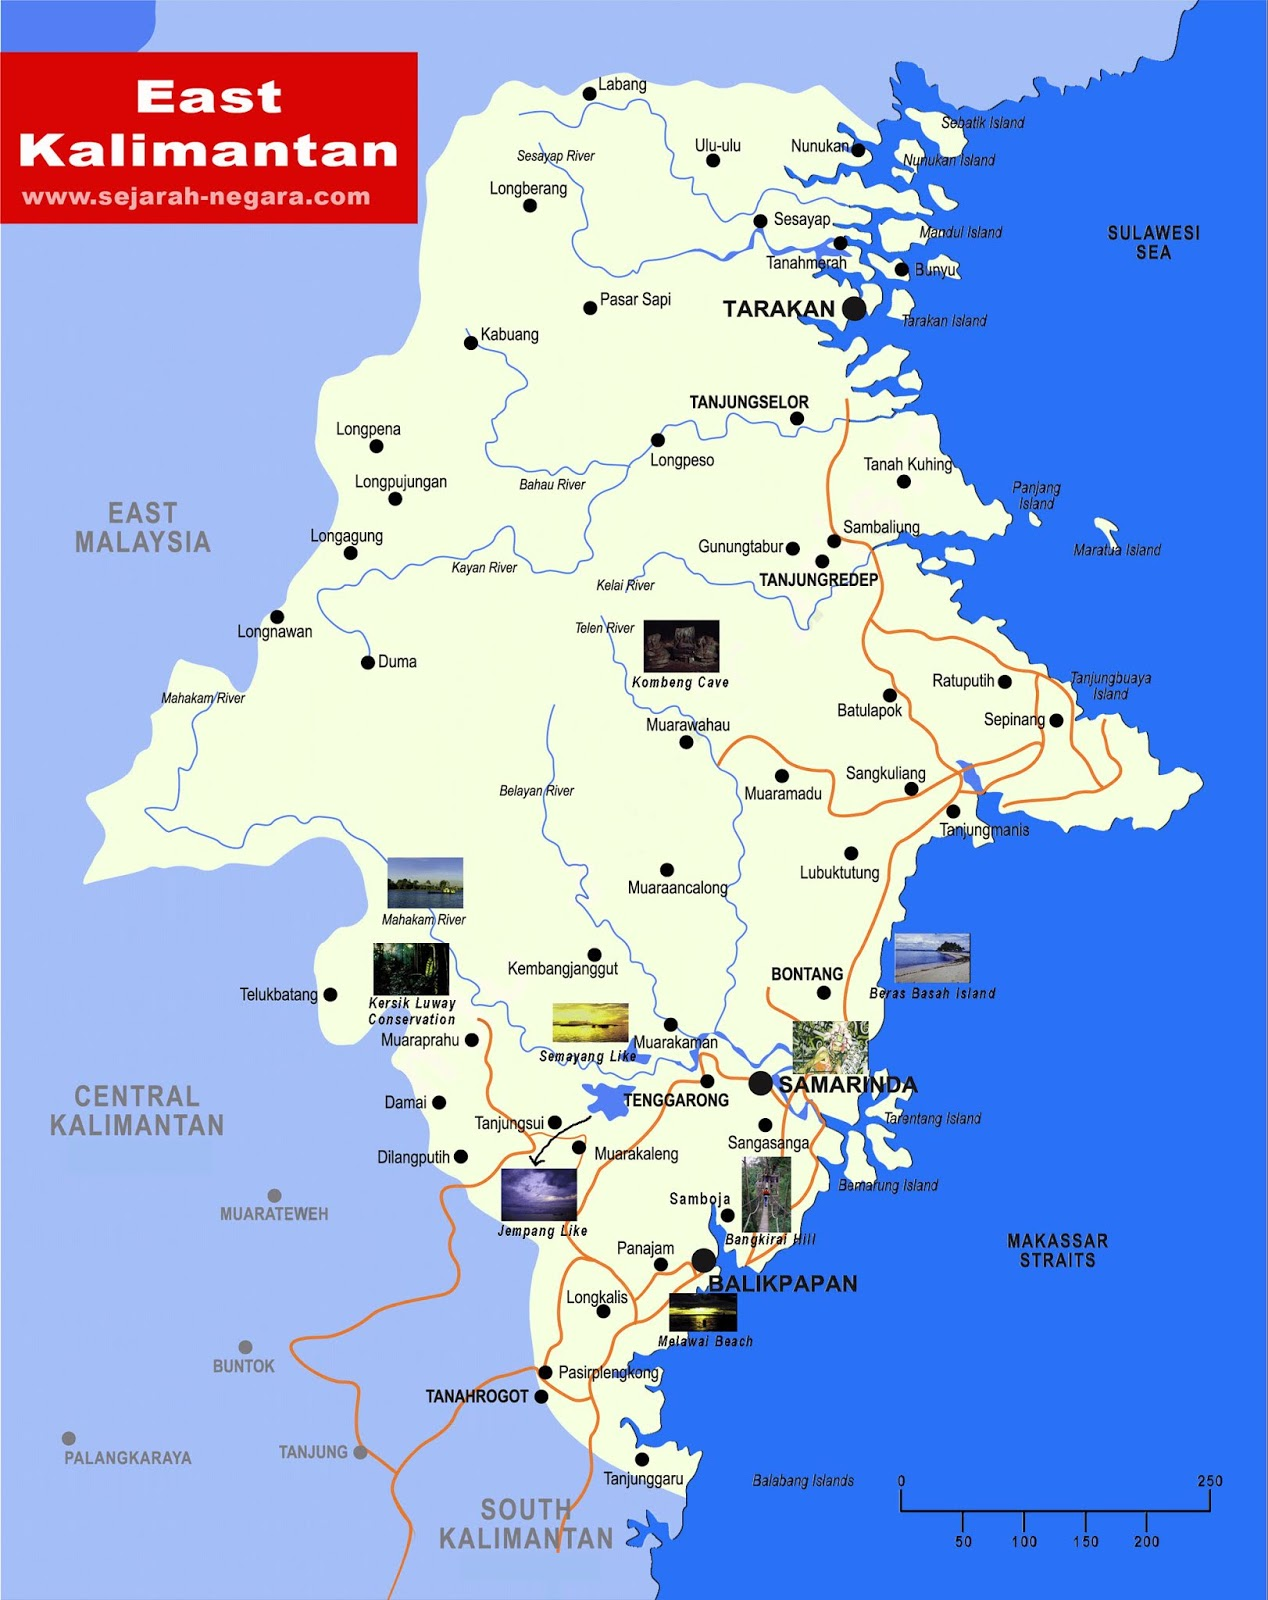 image: Map of East Kalimantan